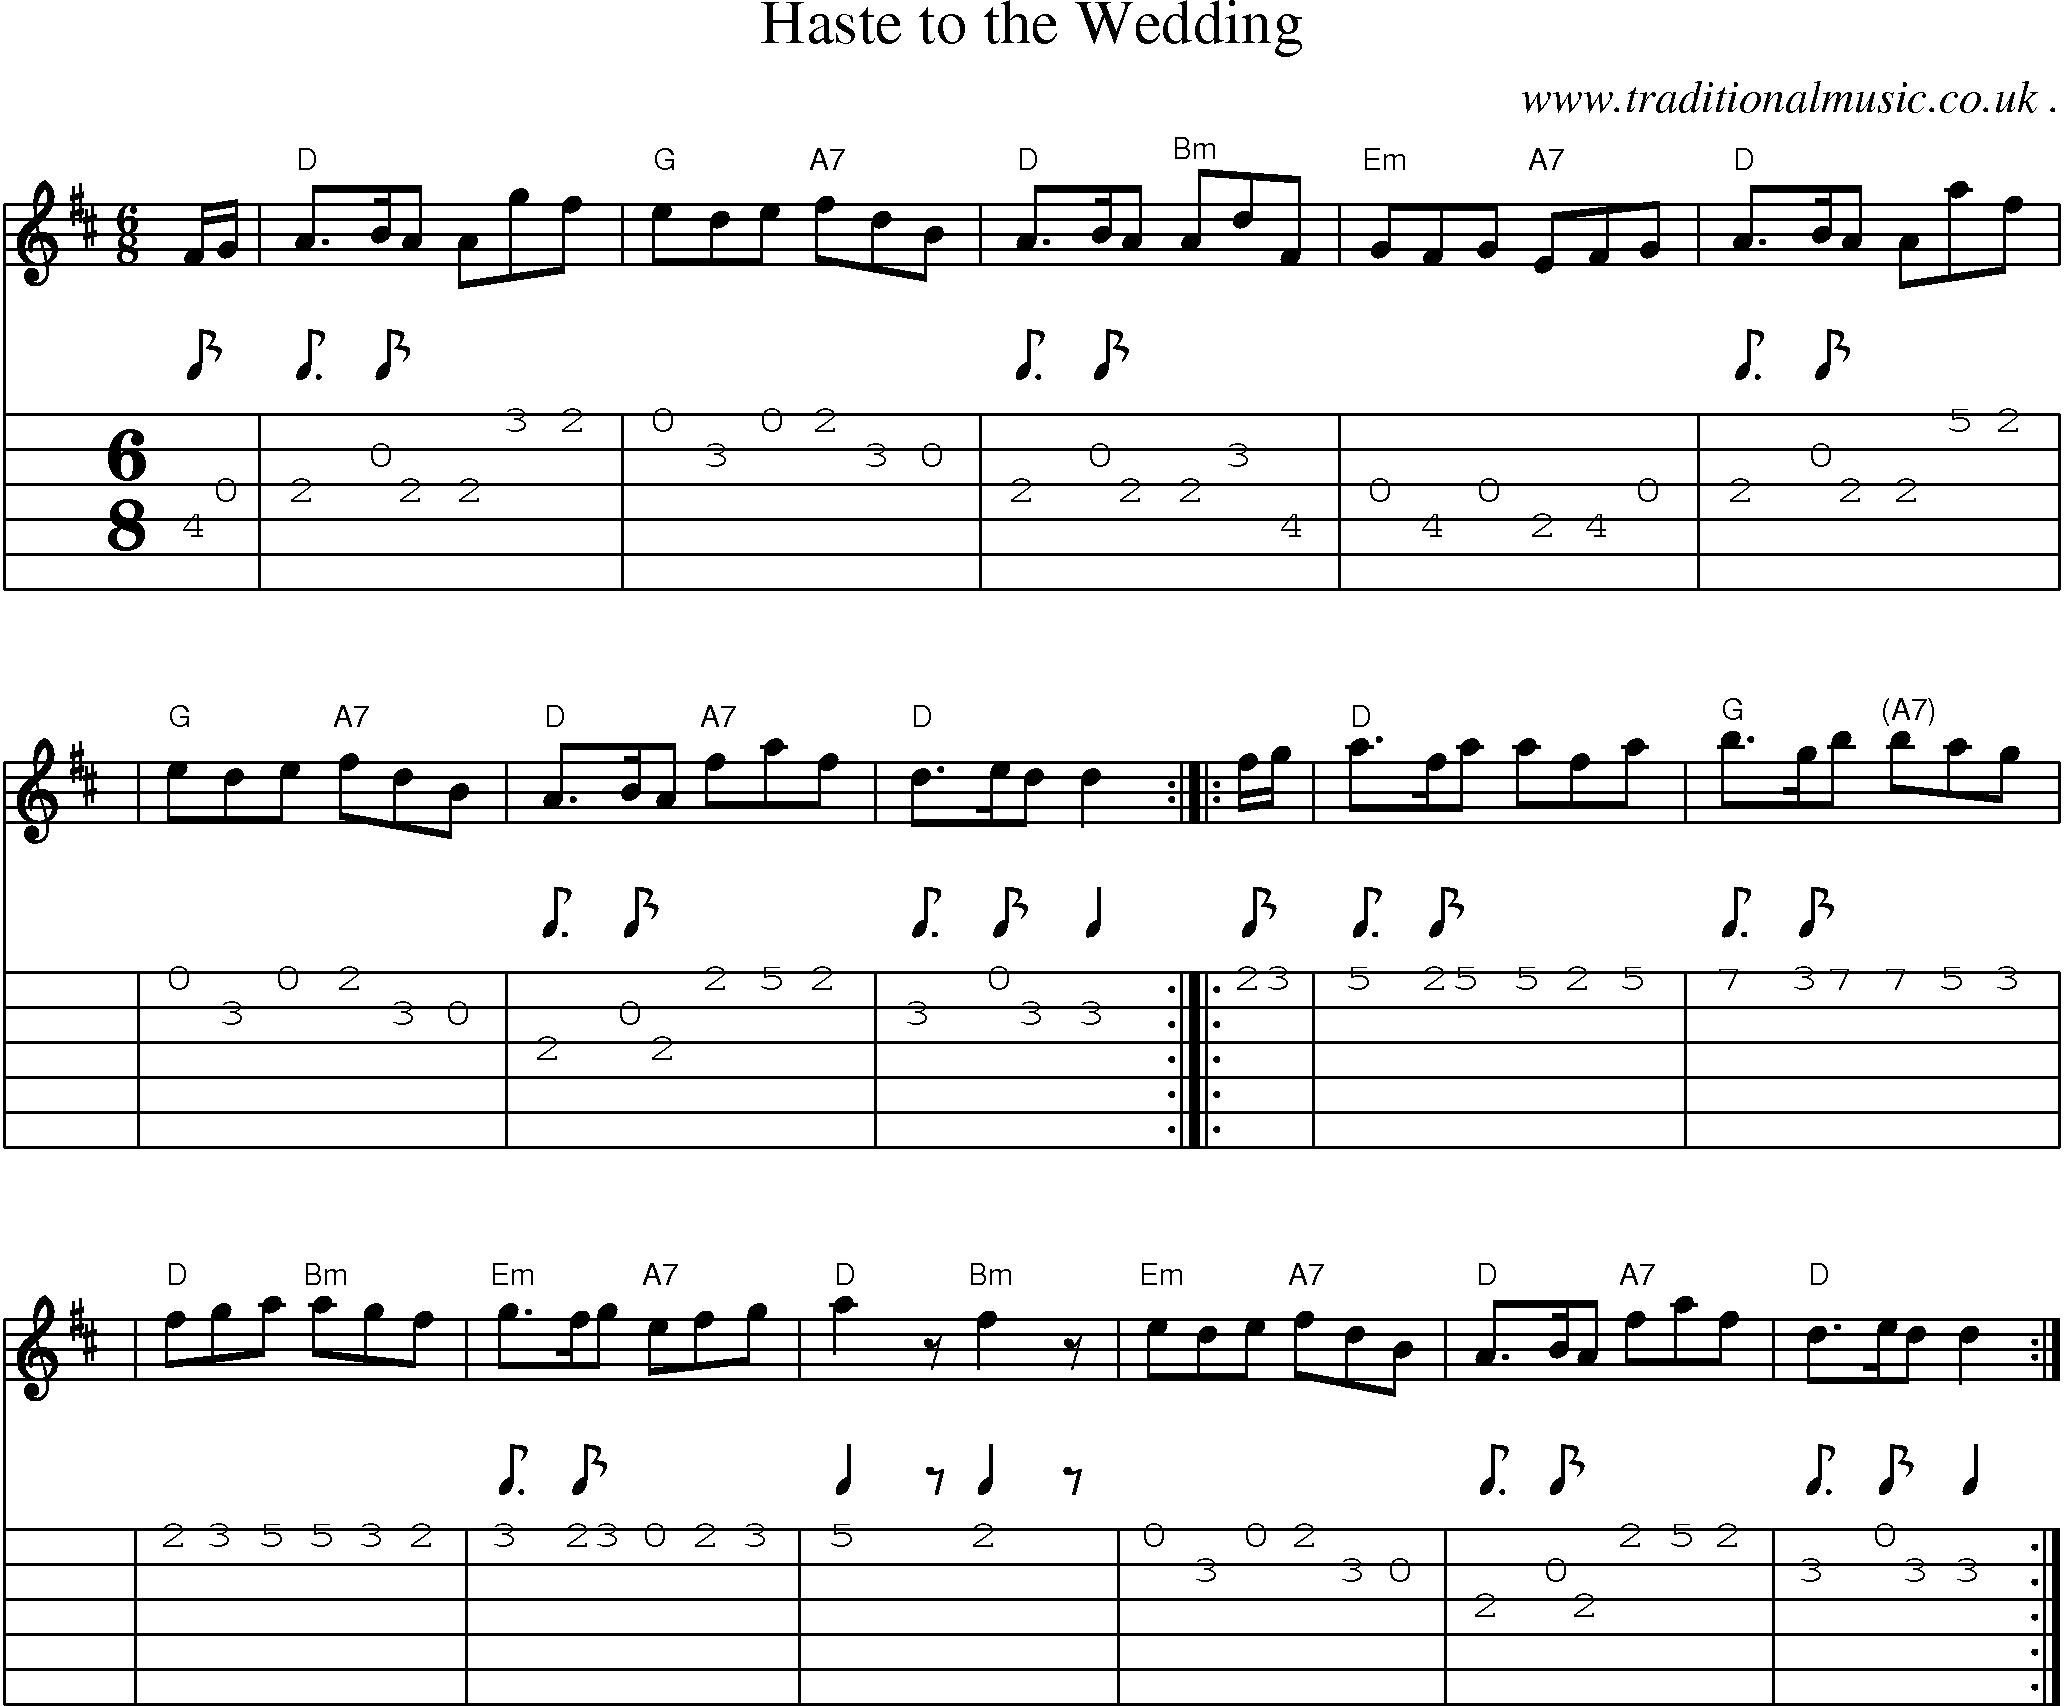 Scottish Tune Score Guitar Chords Tabs Haste To The Wedding